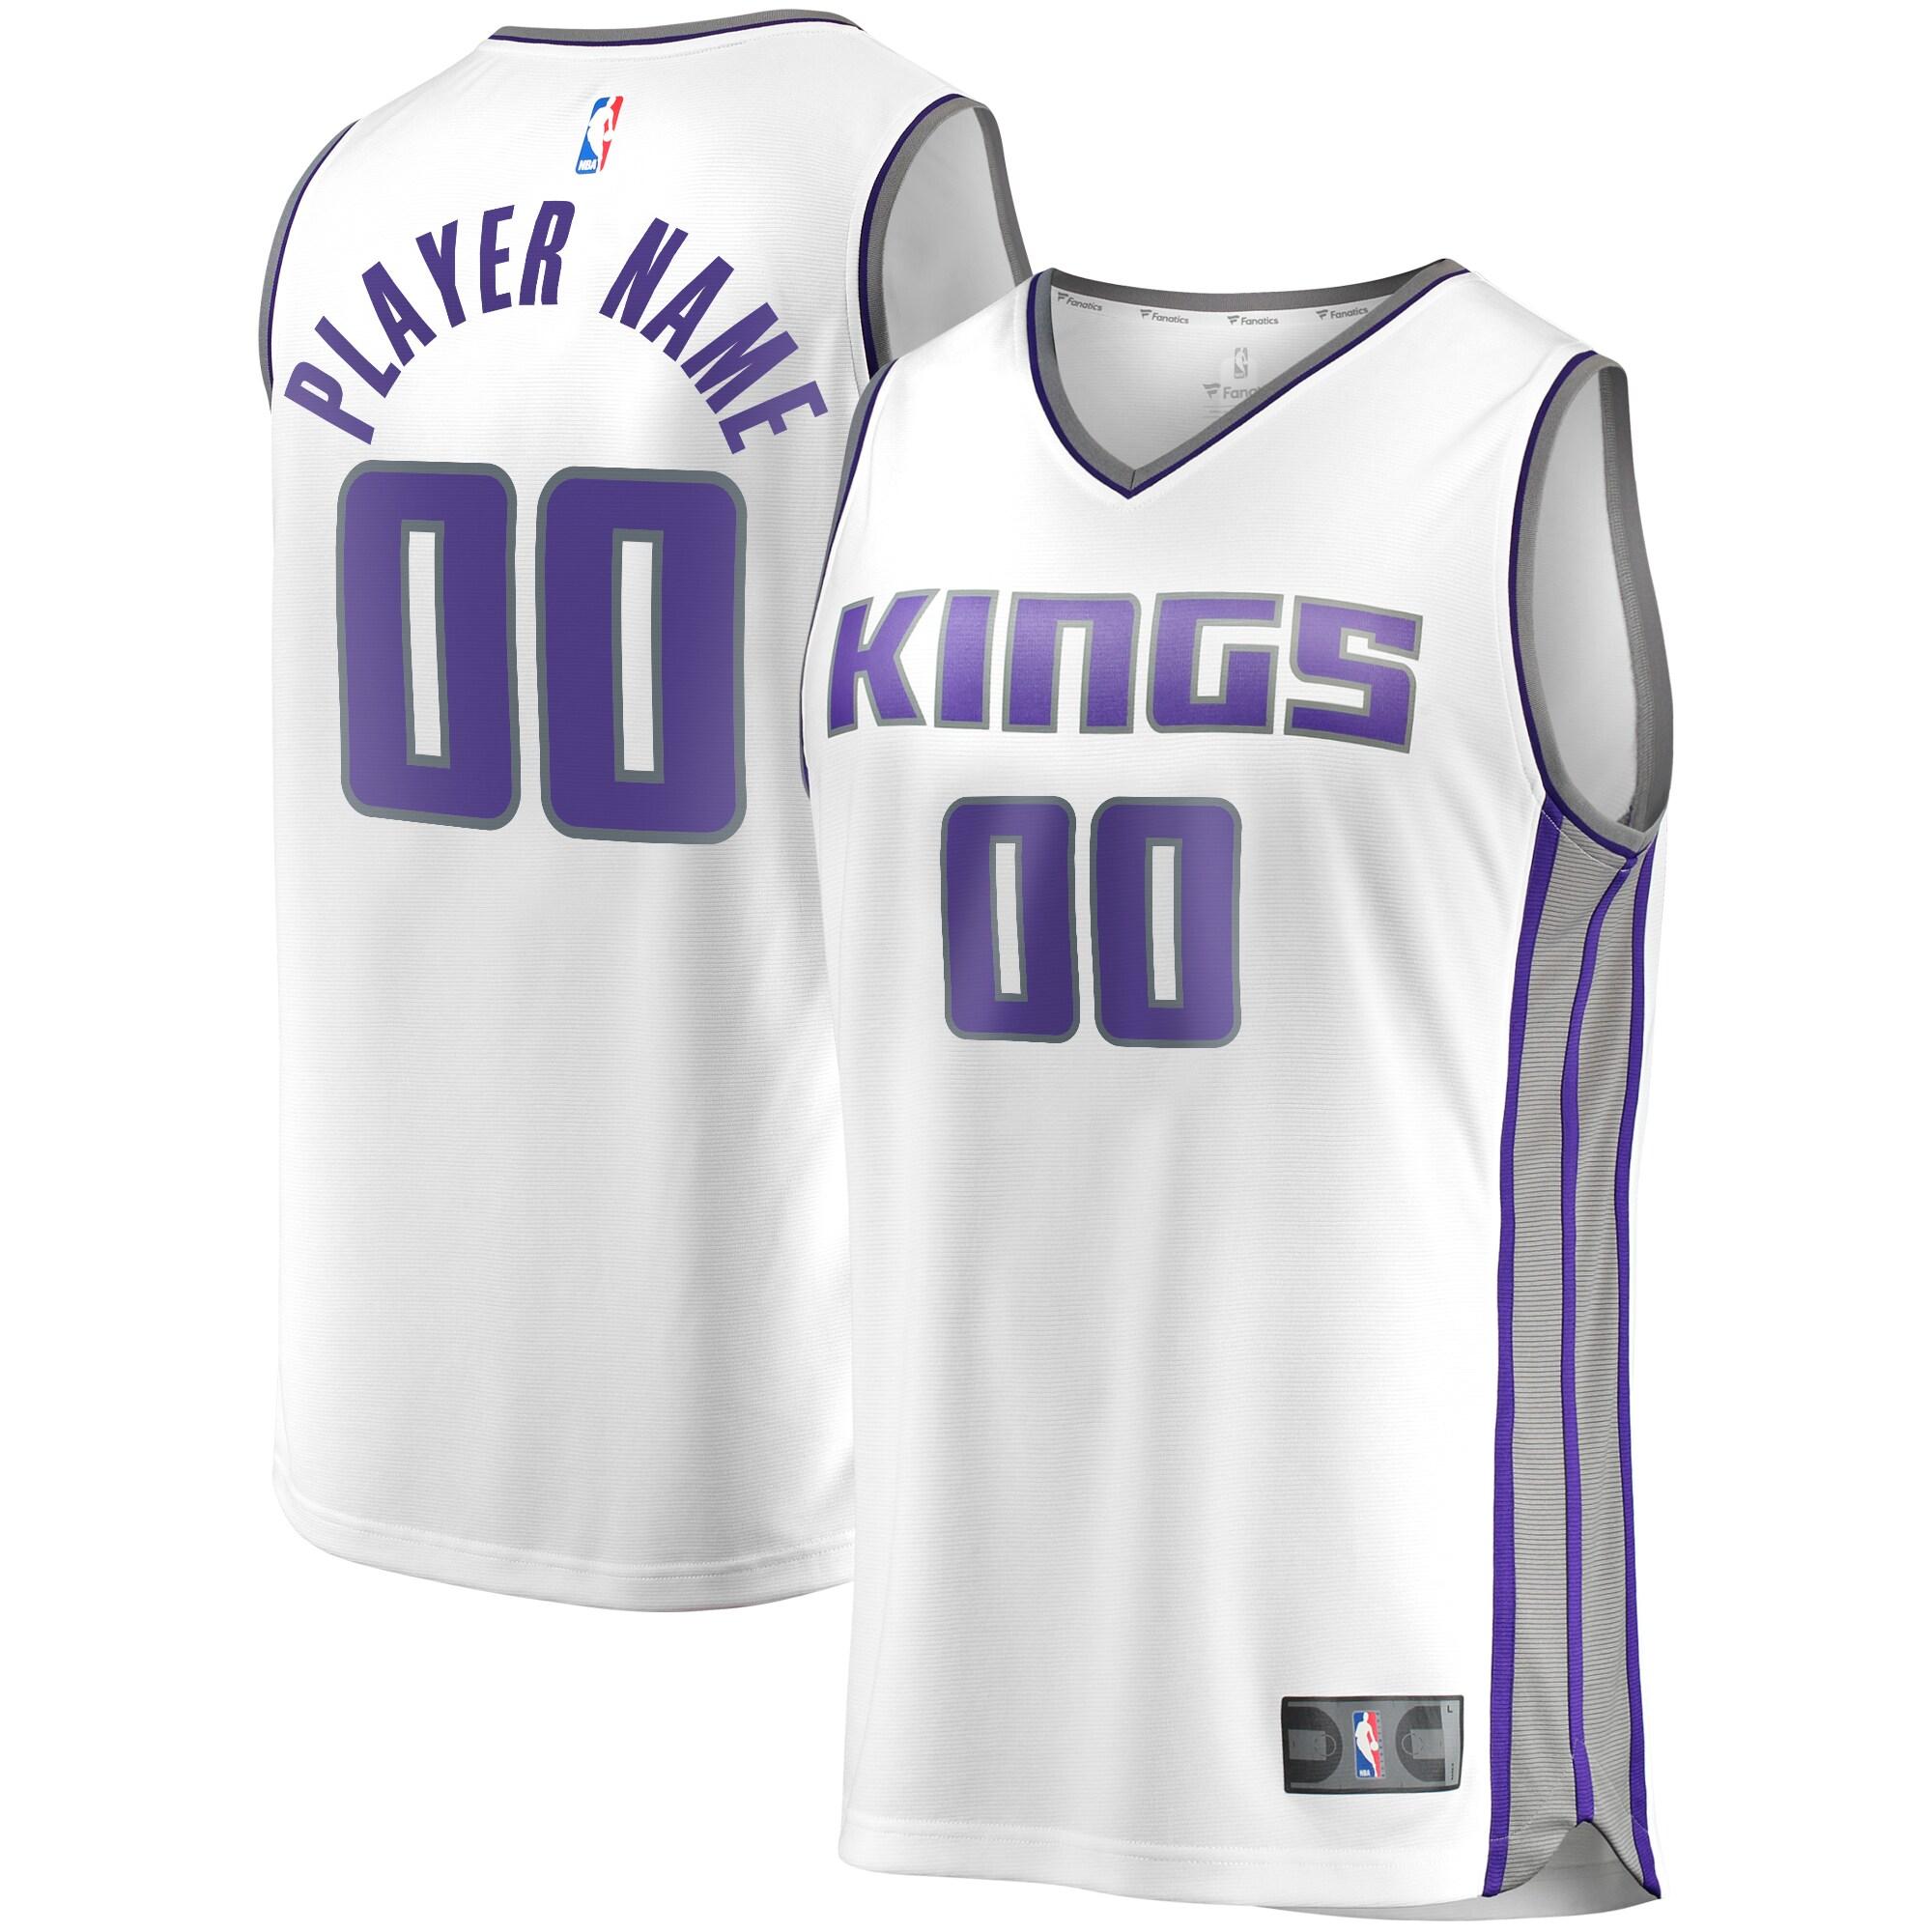 Sacramento Kings Fanatics Branded Fast Break Custom Replica Jersey White - Association Edition